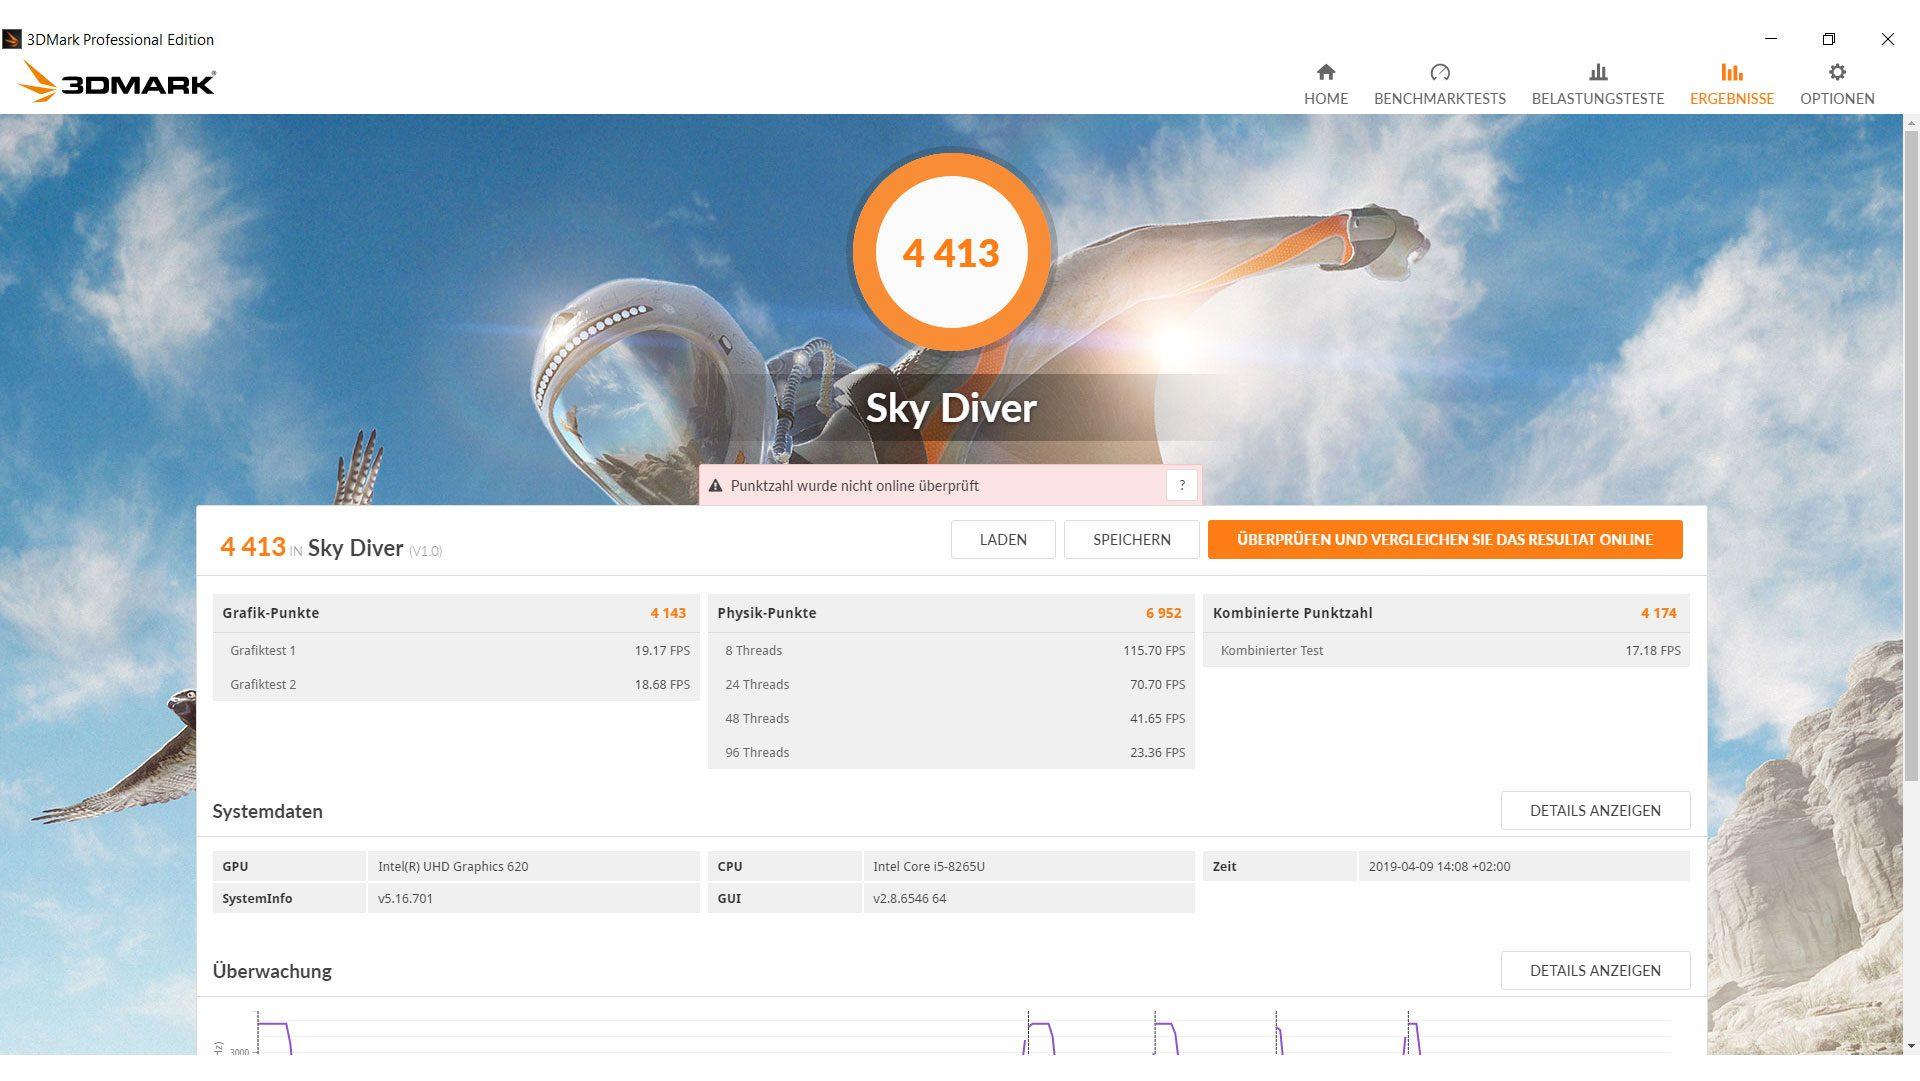 Acer Aspire 5 A515-52-55JD Benchmark_9